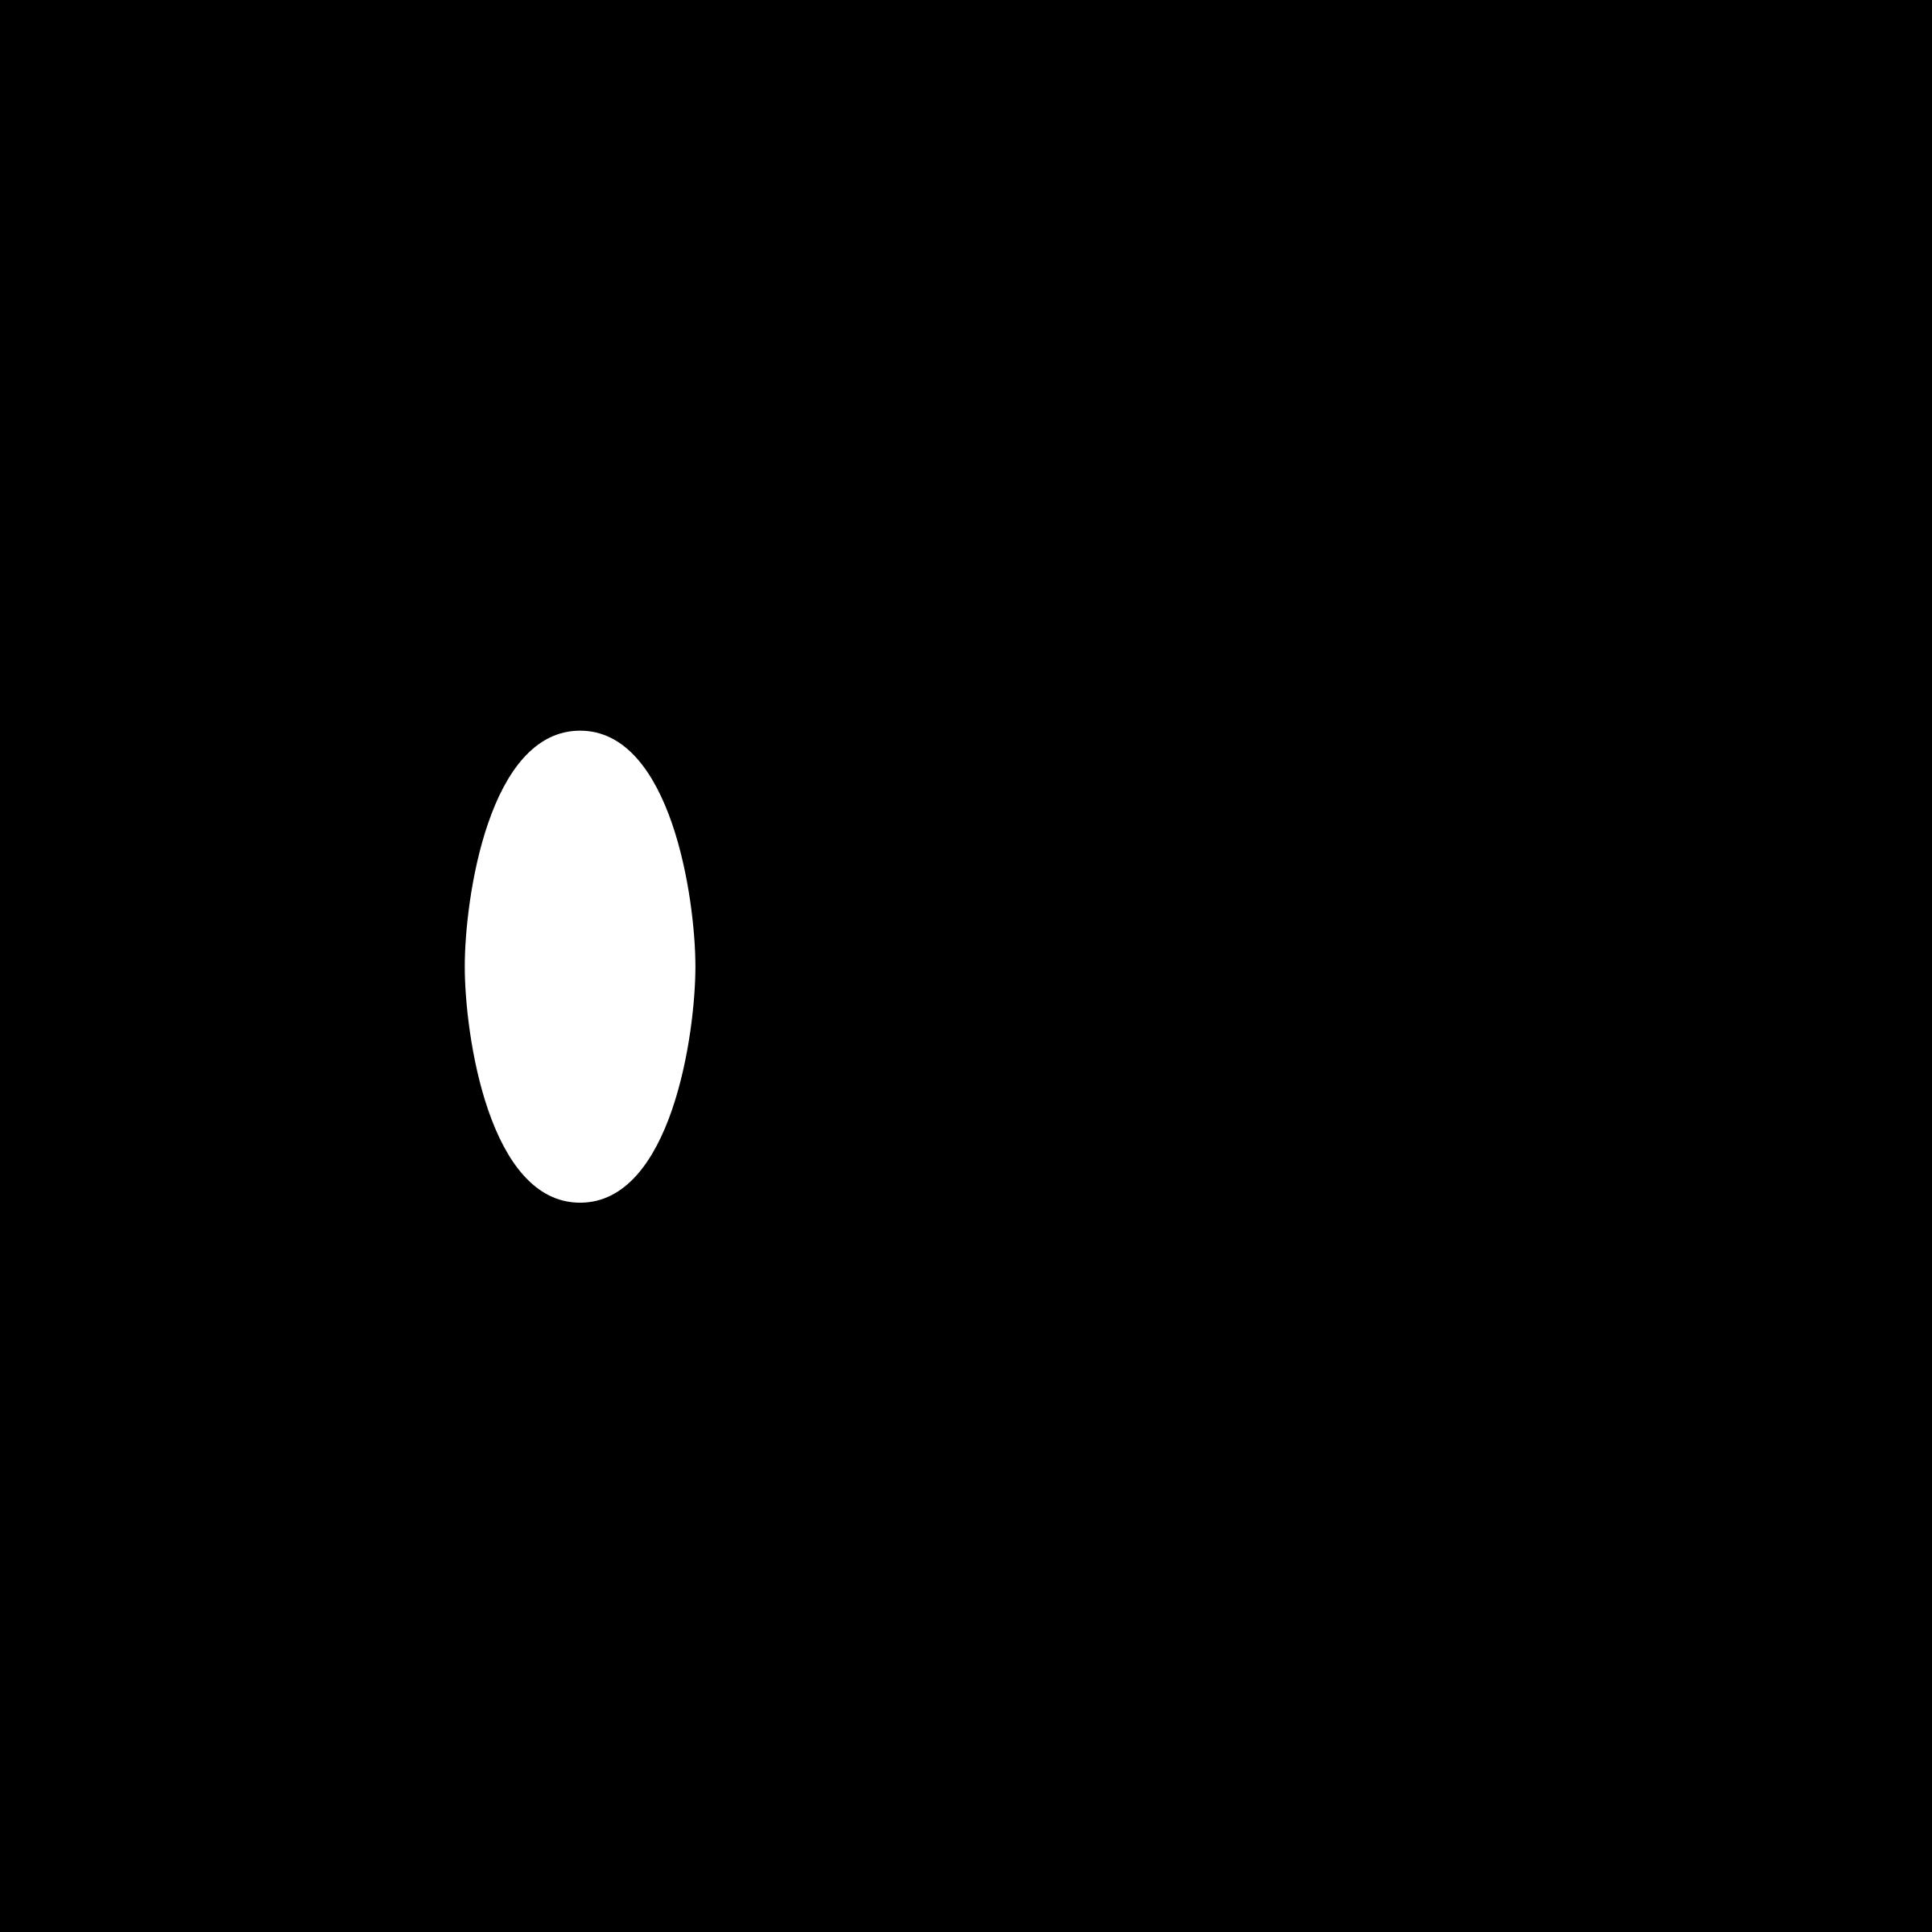 vogue-logo-png-transparent.png